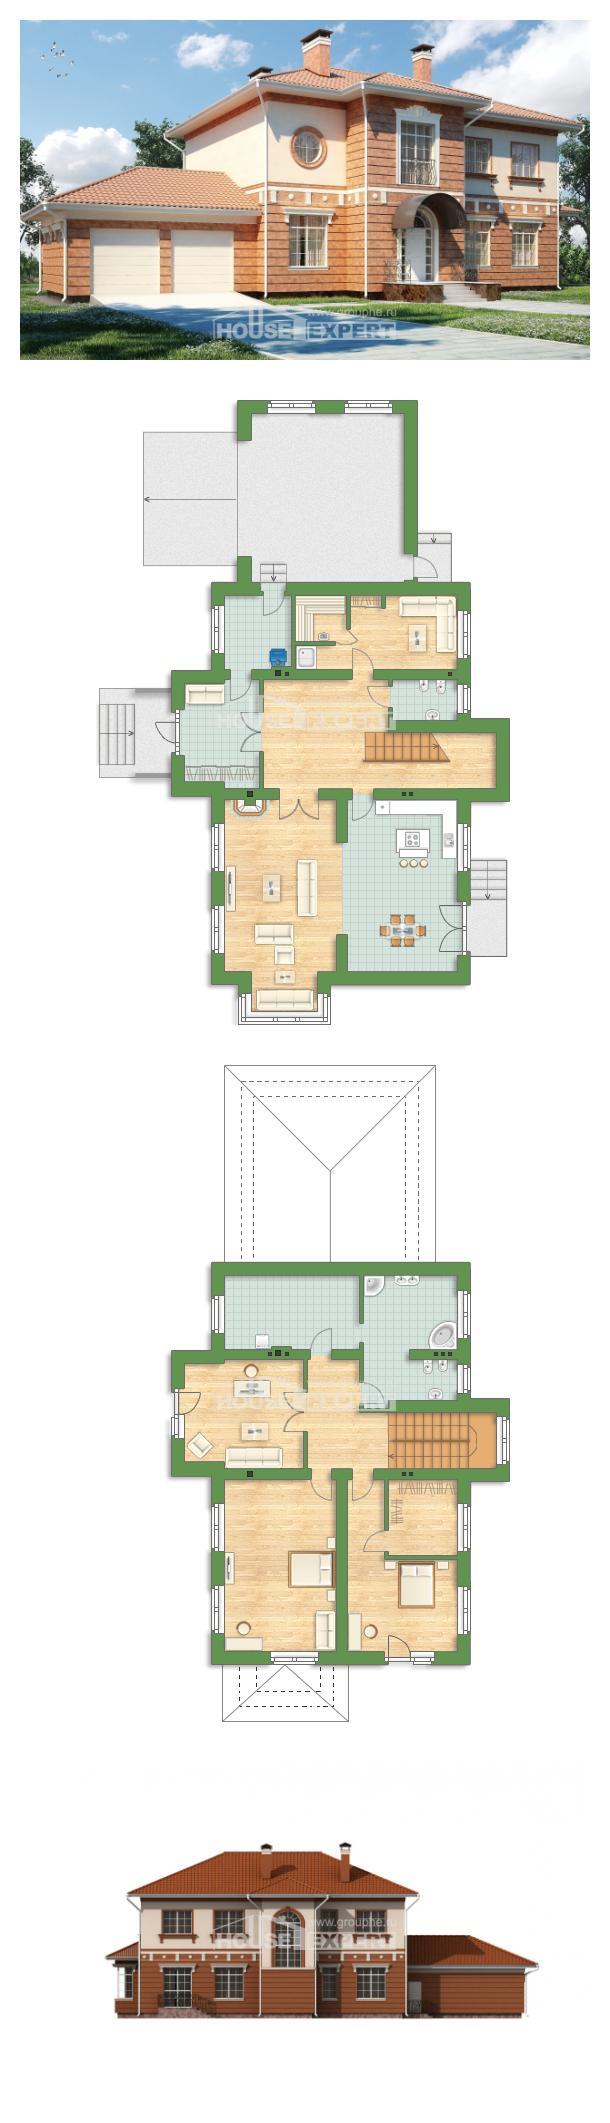 Проект дома 285-001-Л   House Expert